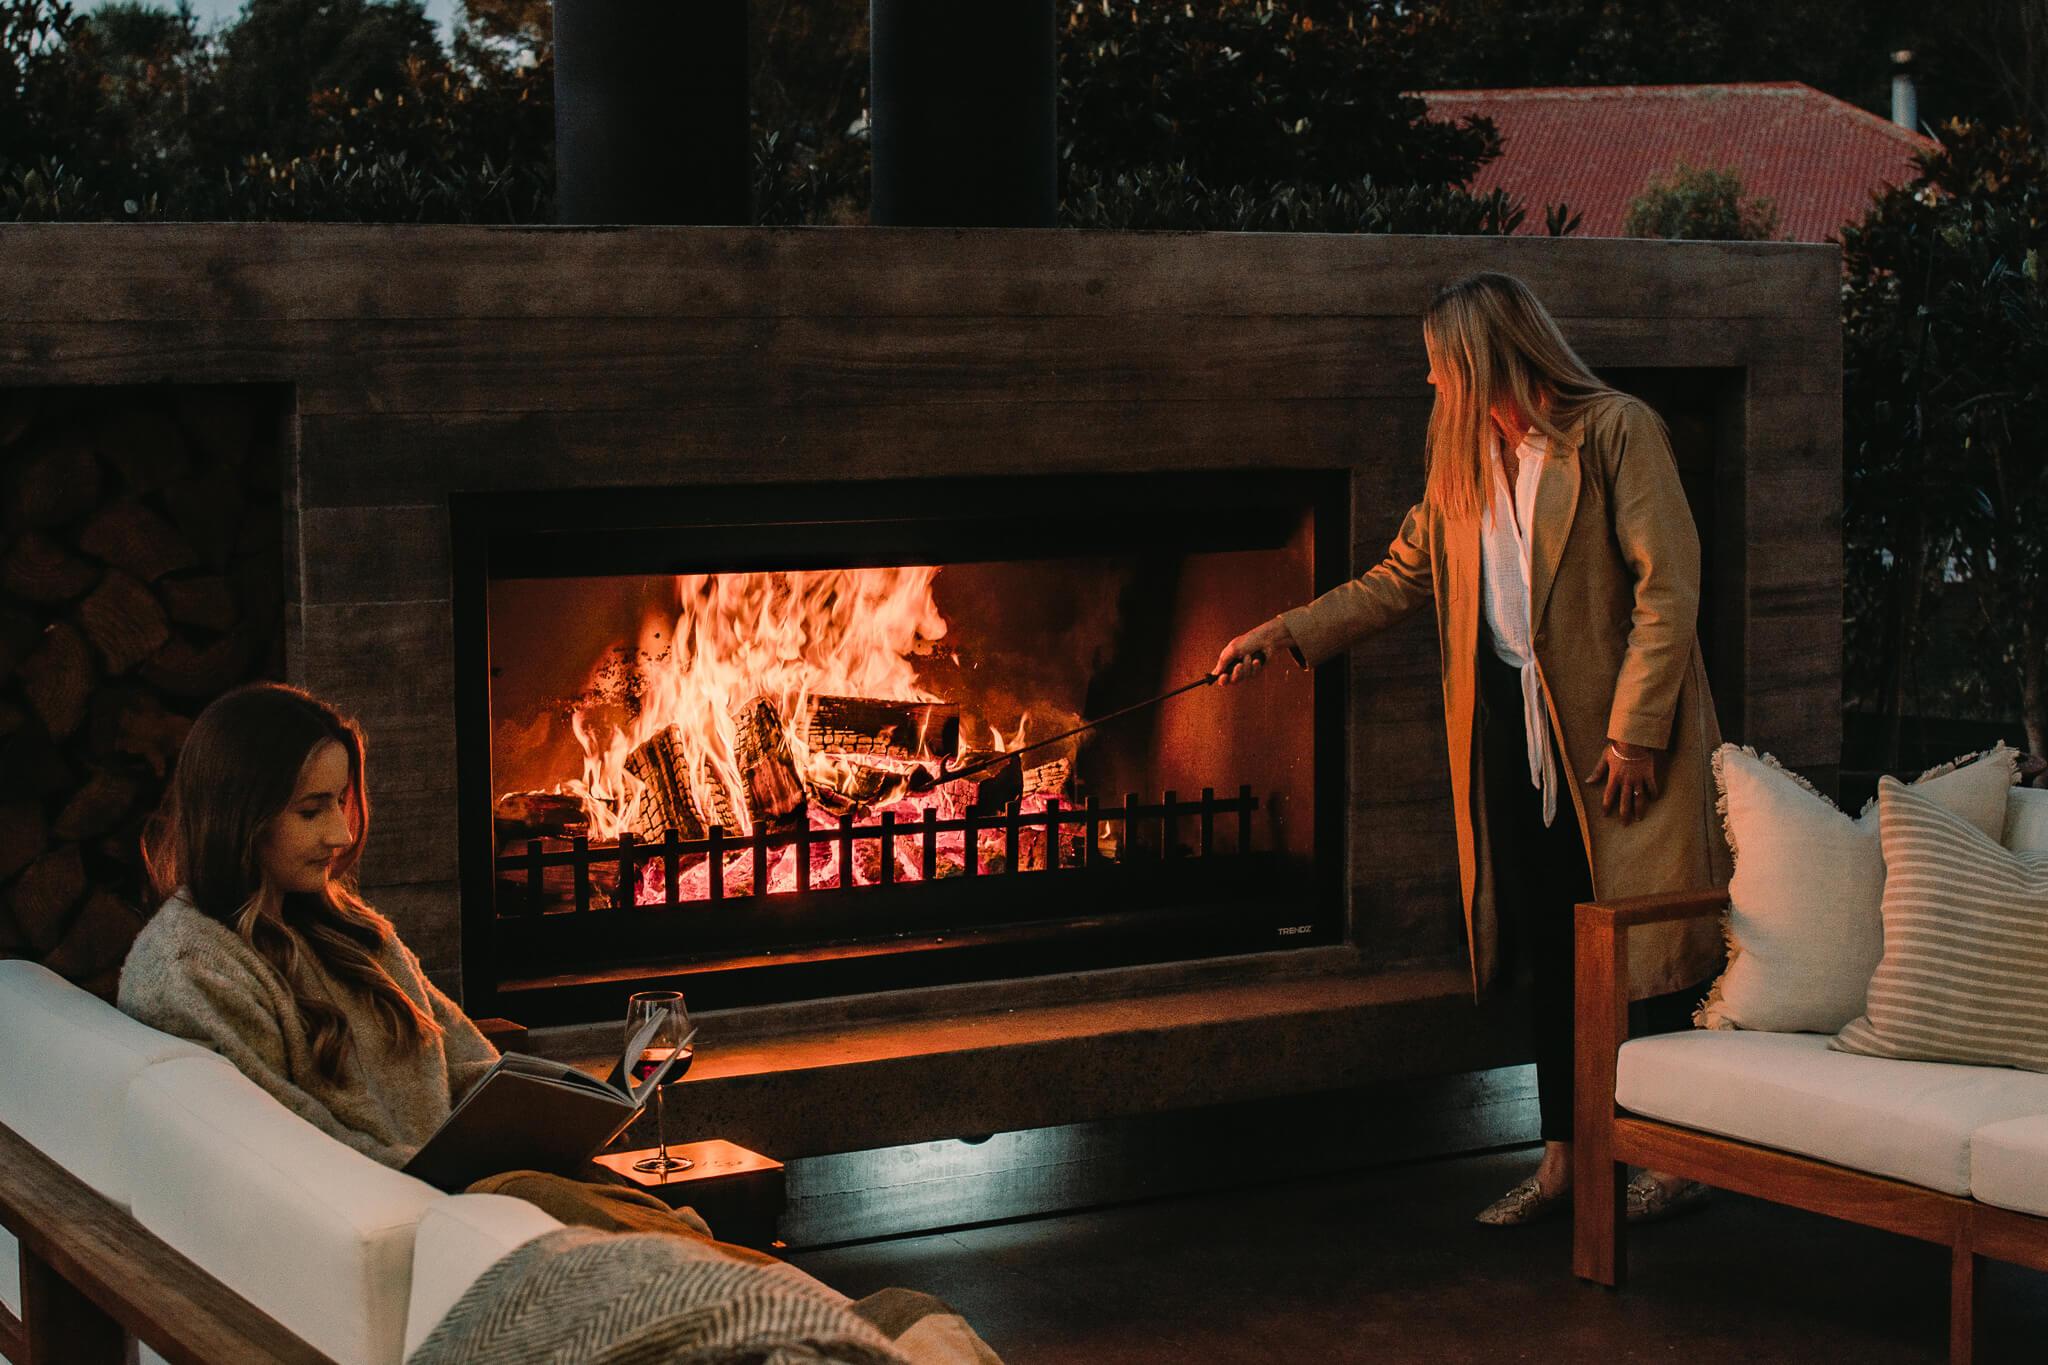 Twin Peak Large Outdoor Fireplace